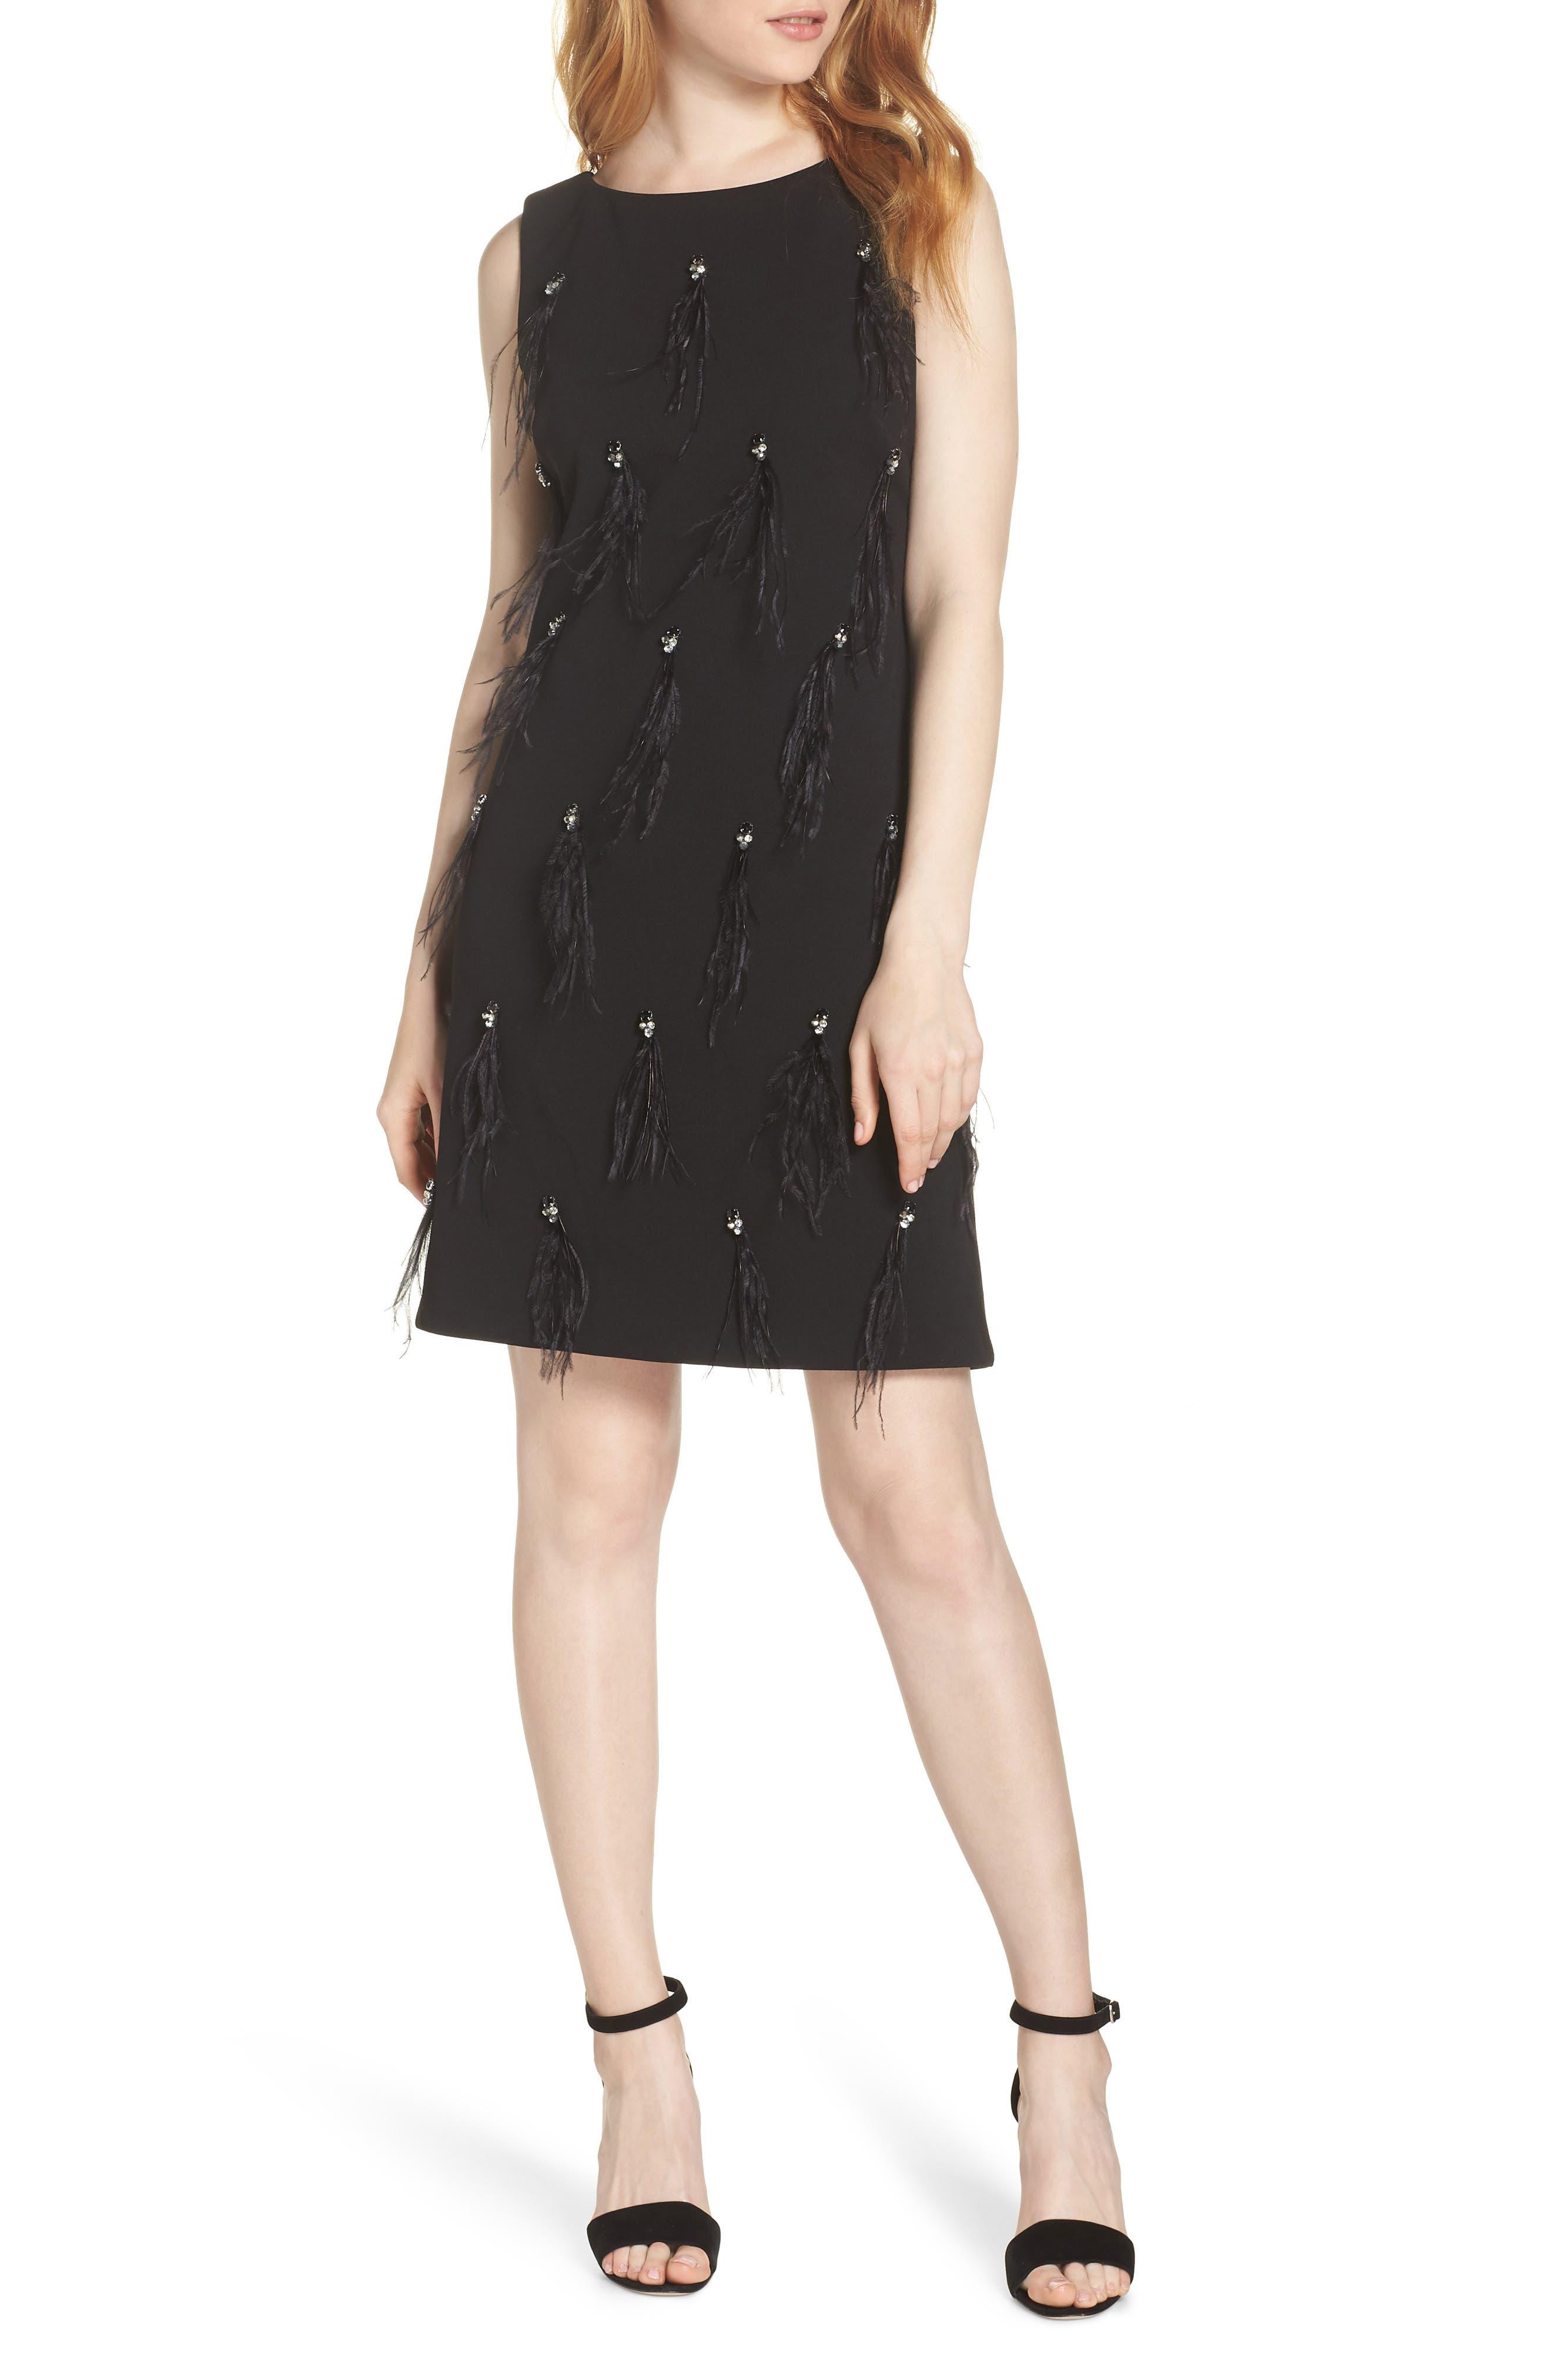 HARPER ROSE,                             Embellished Sheath Dress,                             Main thumbnail 1, color,                             BLACK